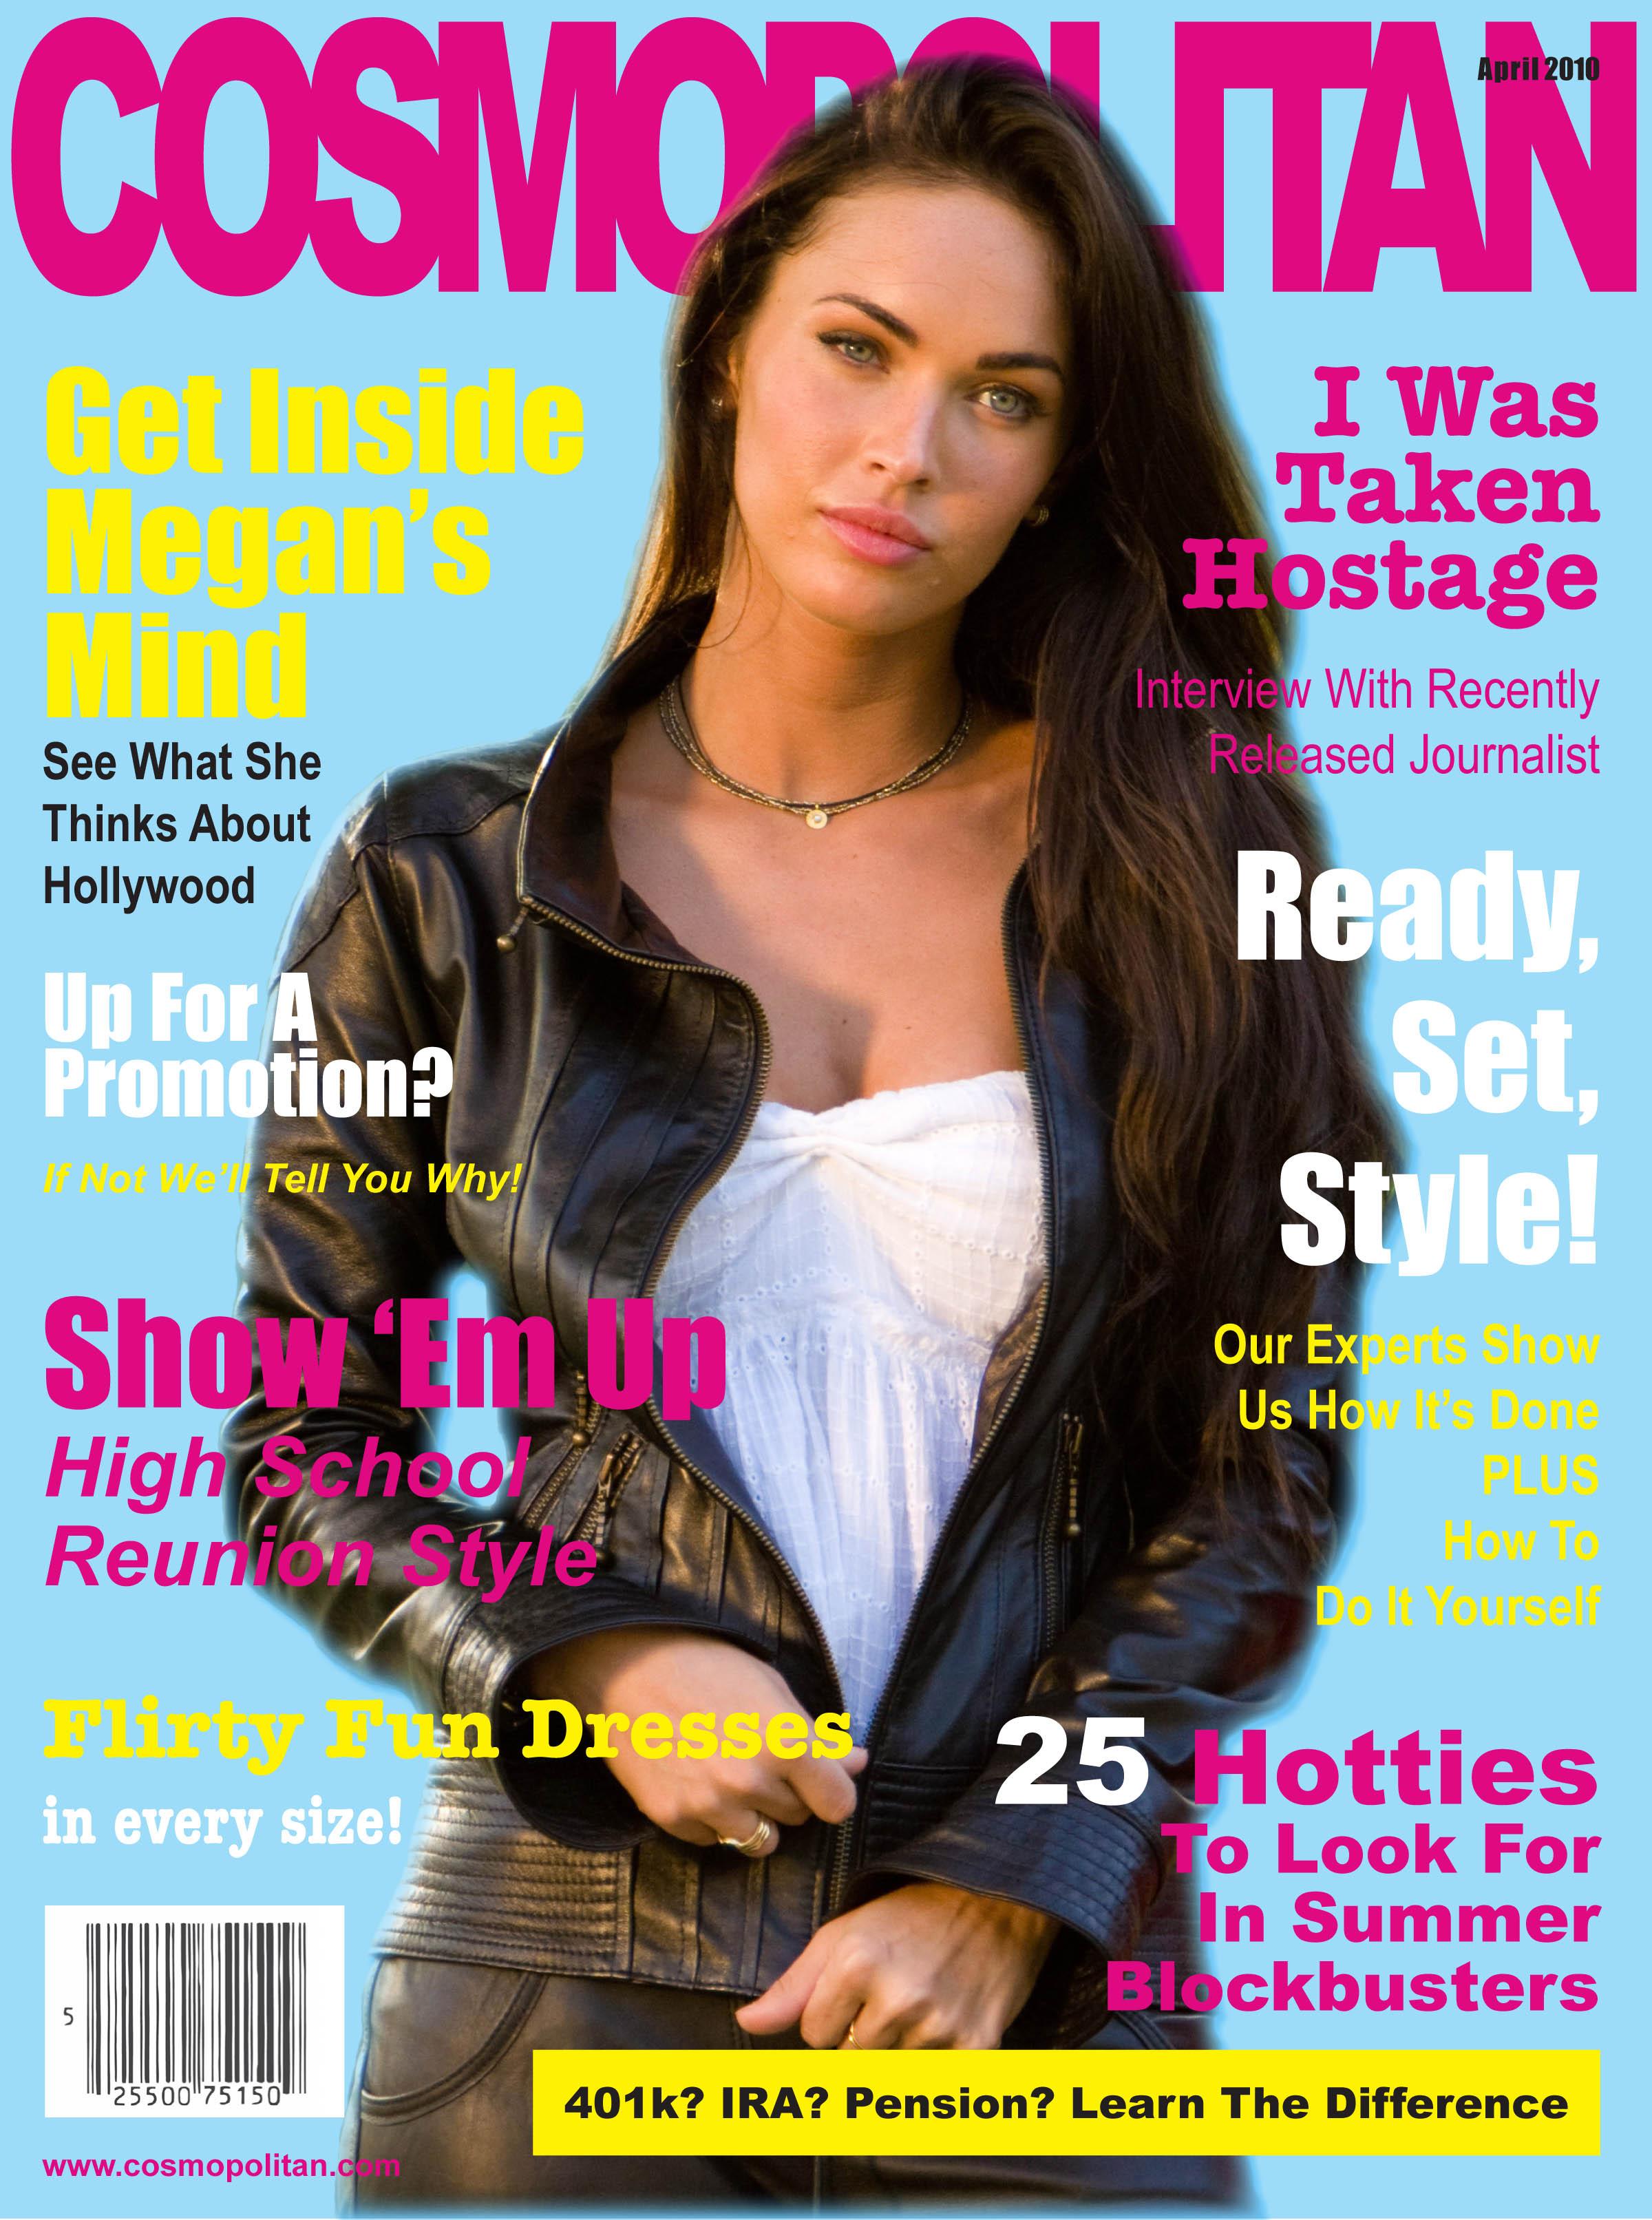 Http Raineyoriginals Wordpress Com 2010 05 02 Cosmopolitan Magazine Covers